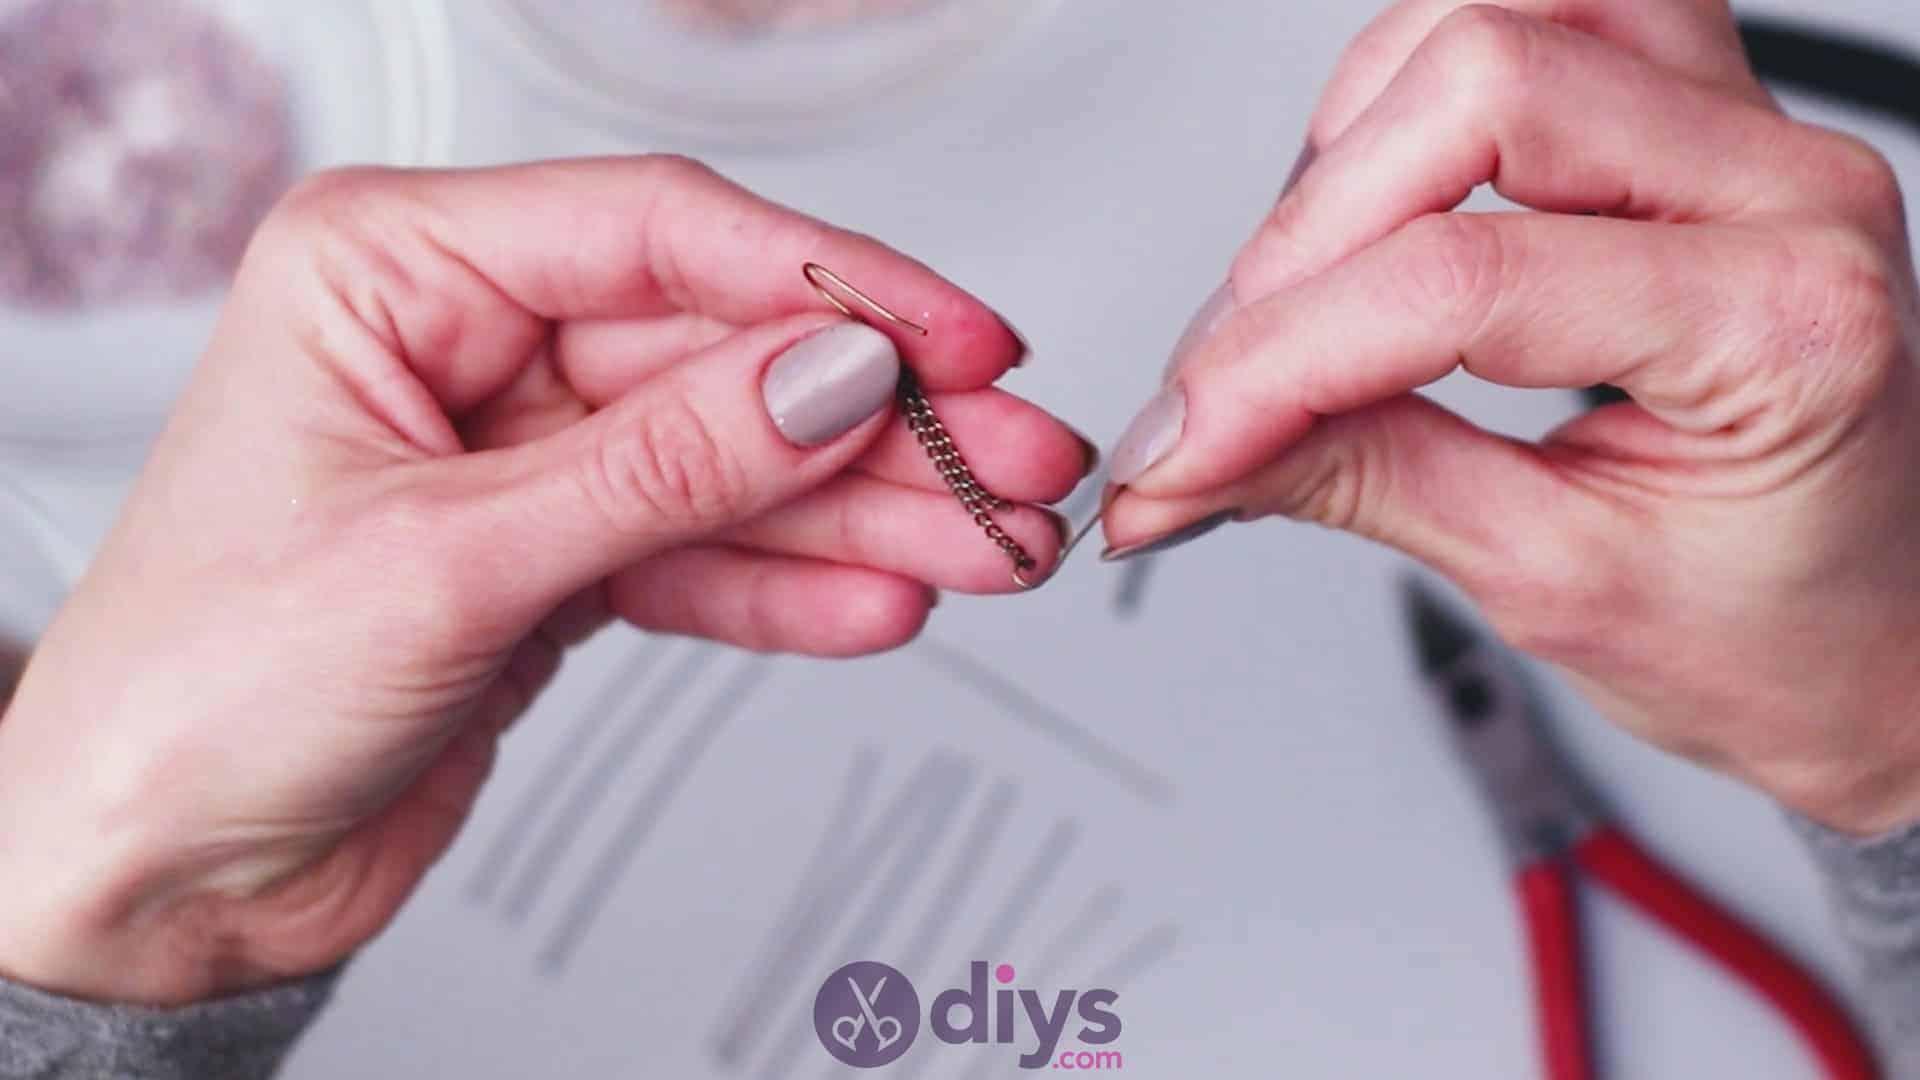 Diy seed bead fringe earrings step 3a